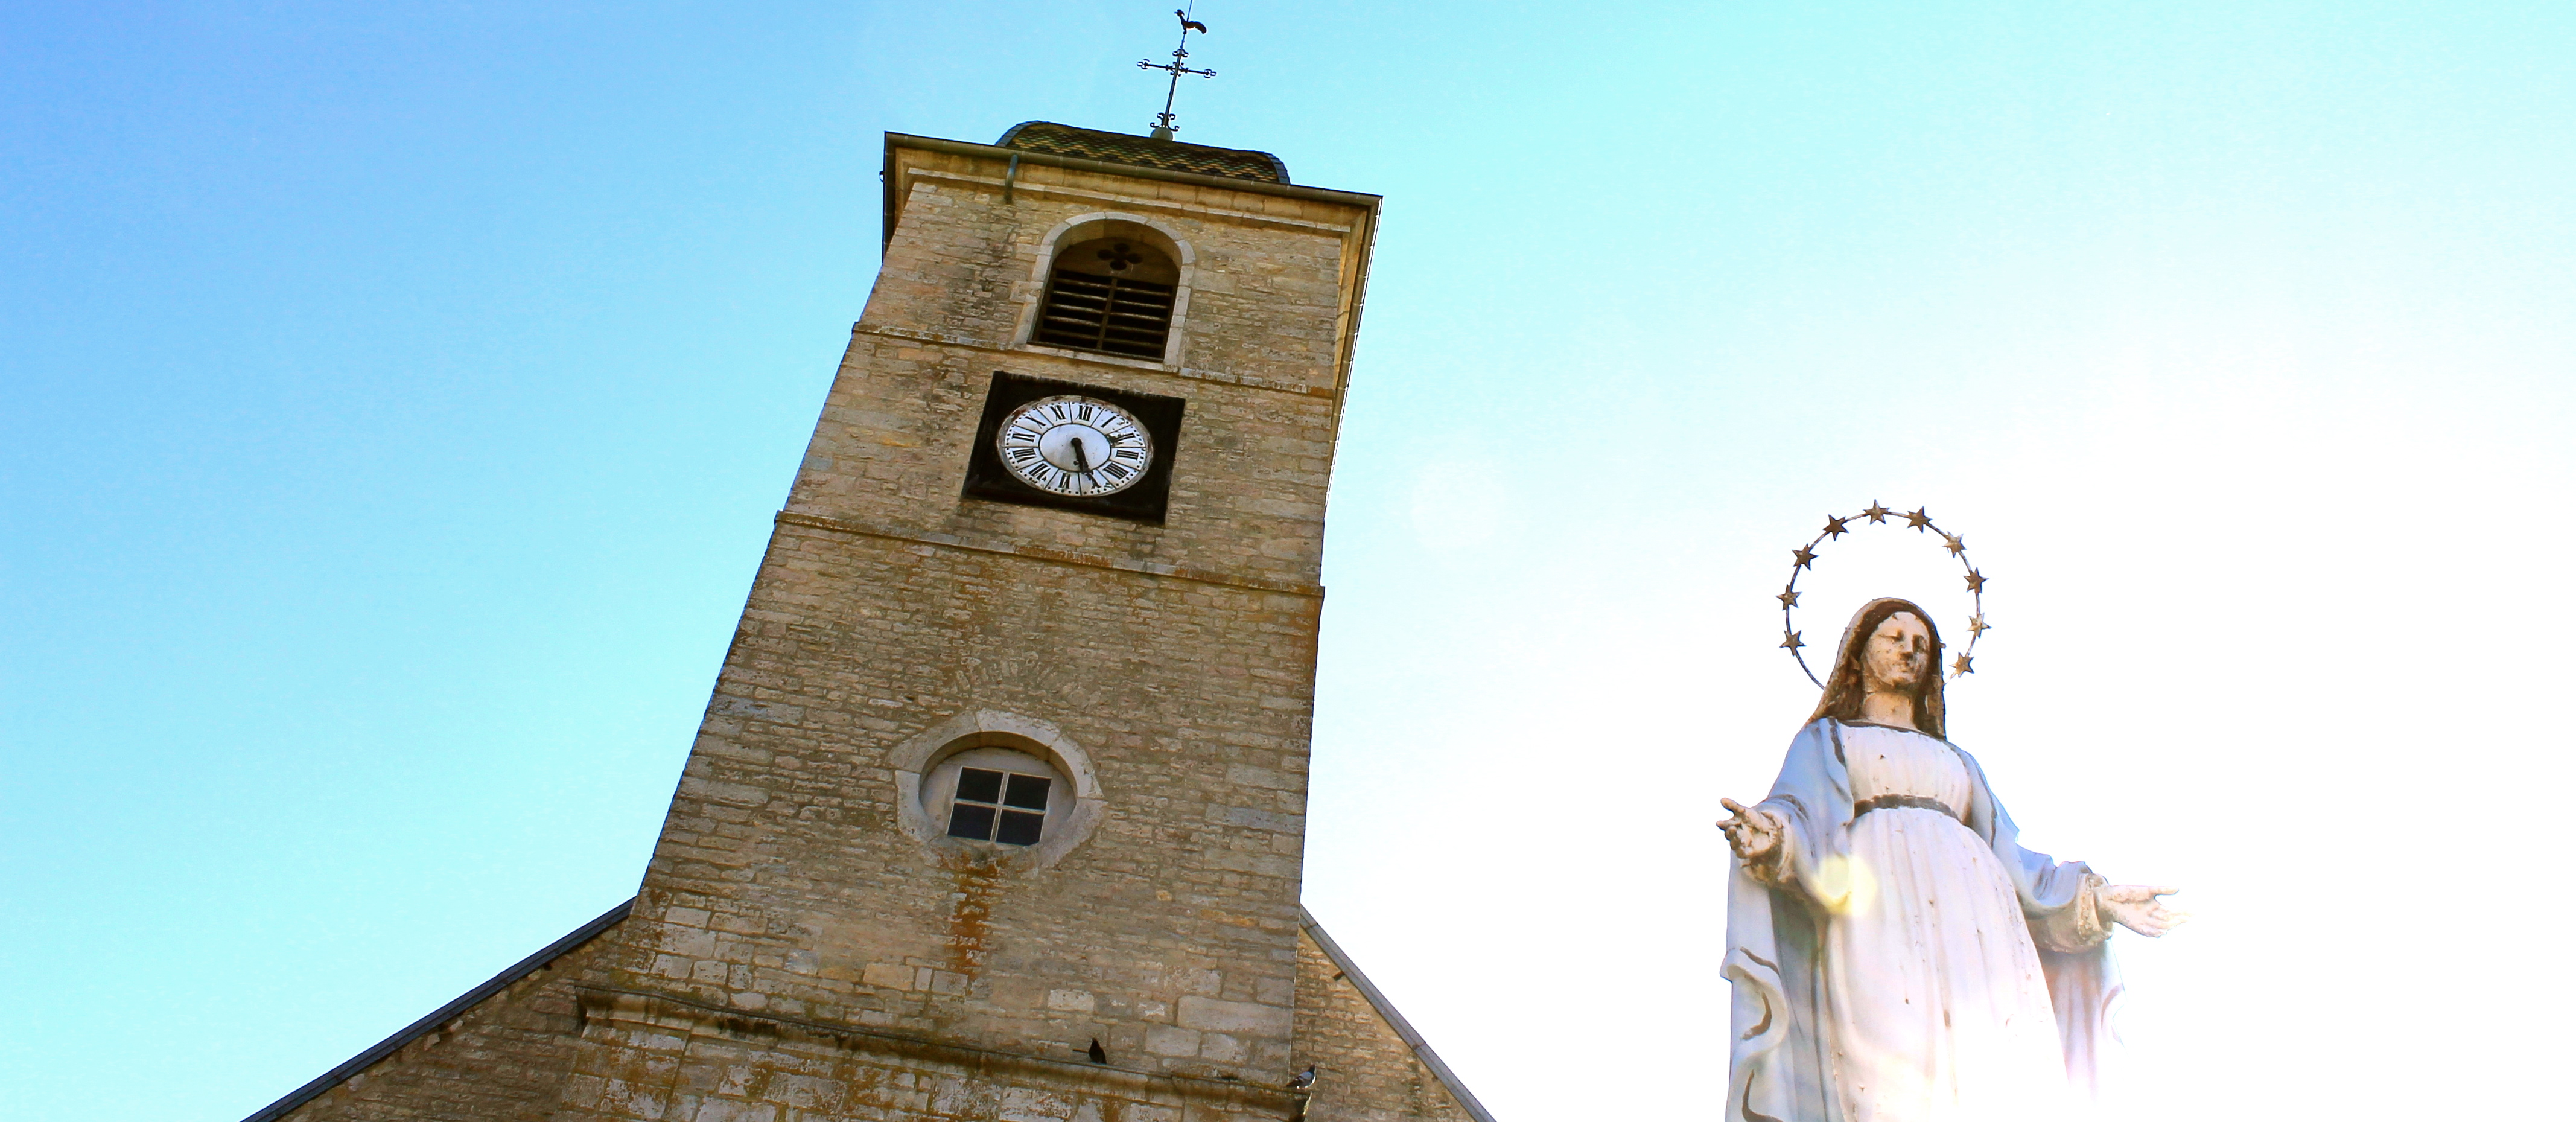 Eglise de Broye-les-Pesmes